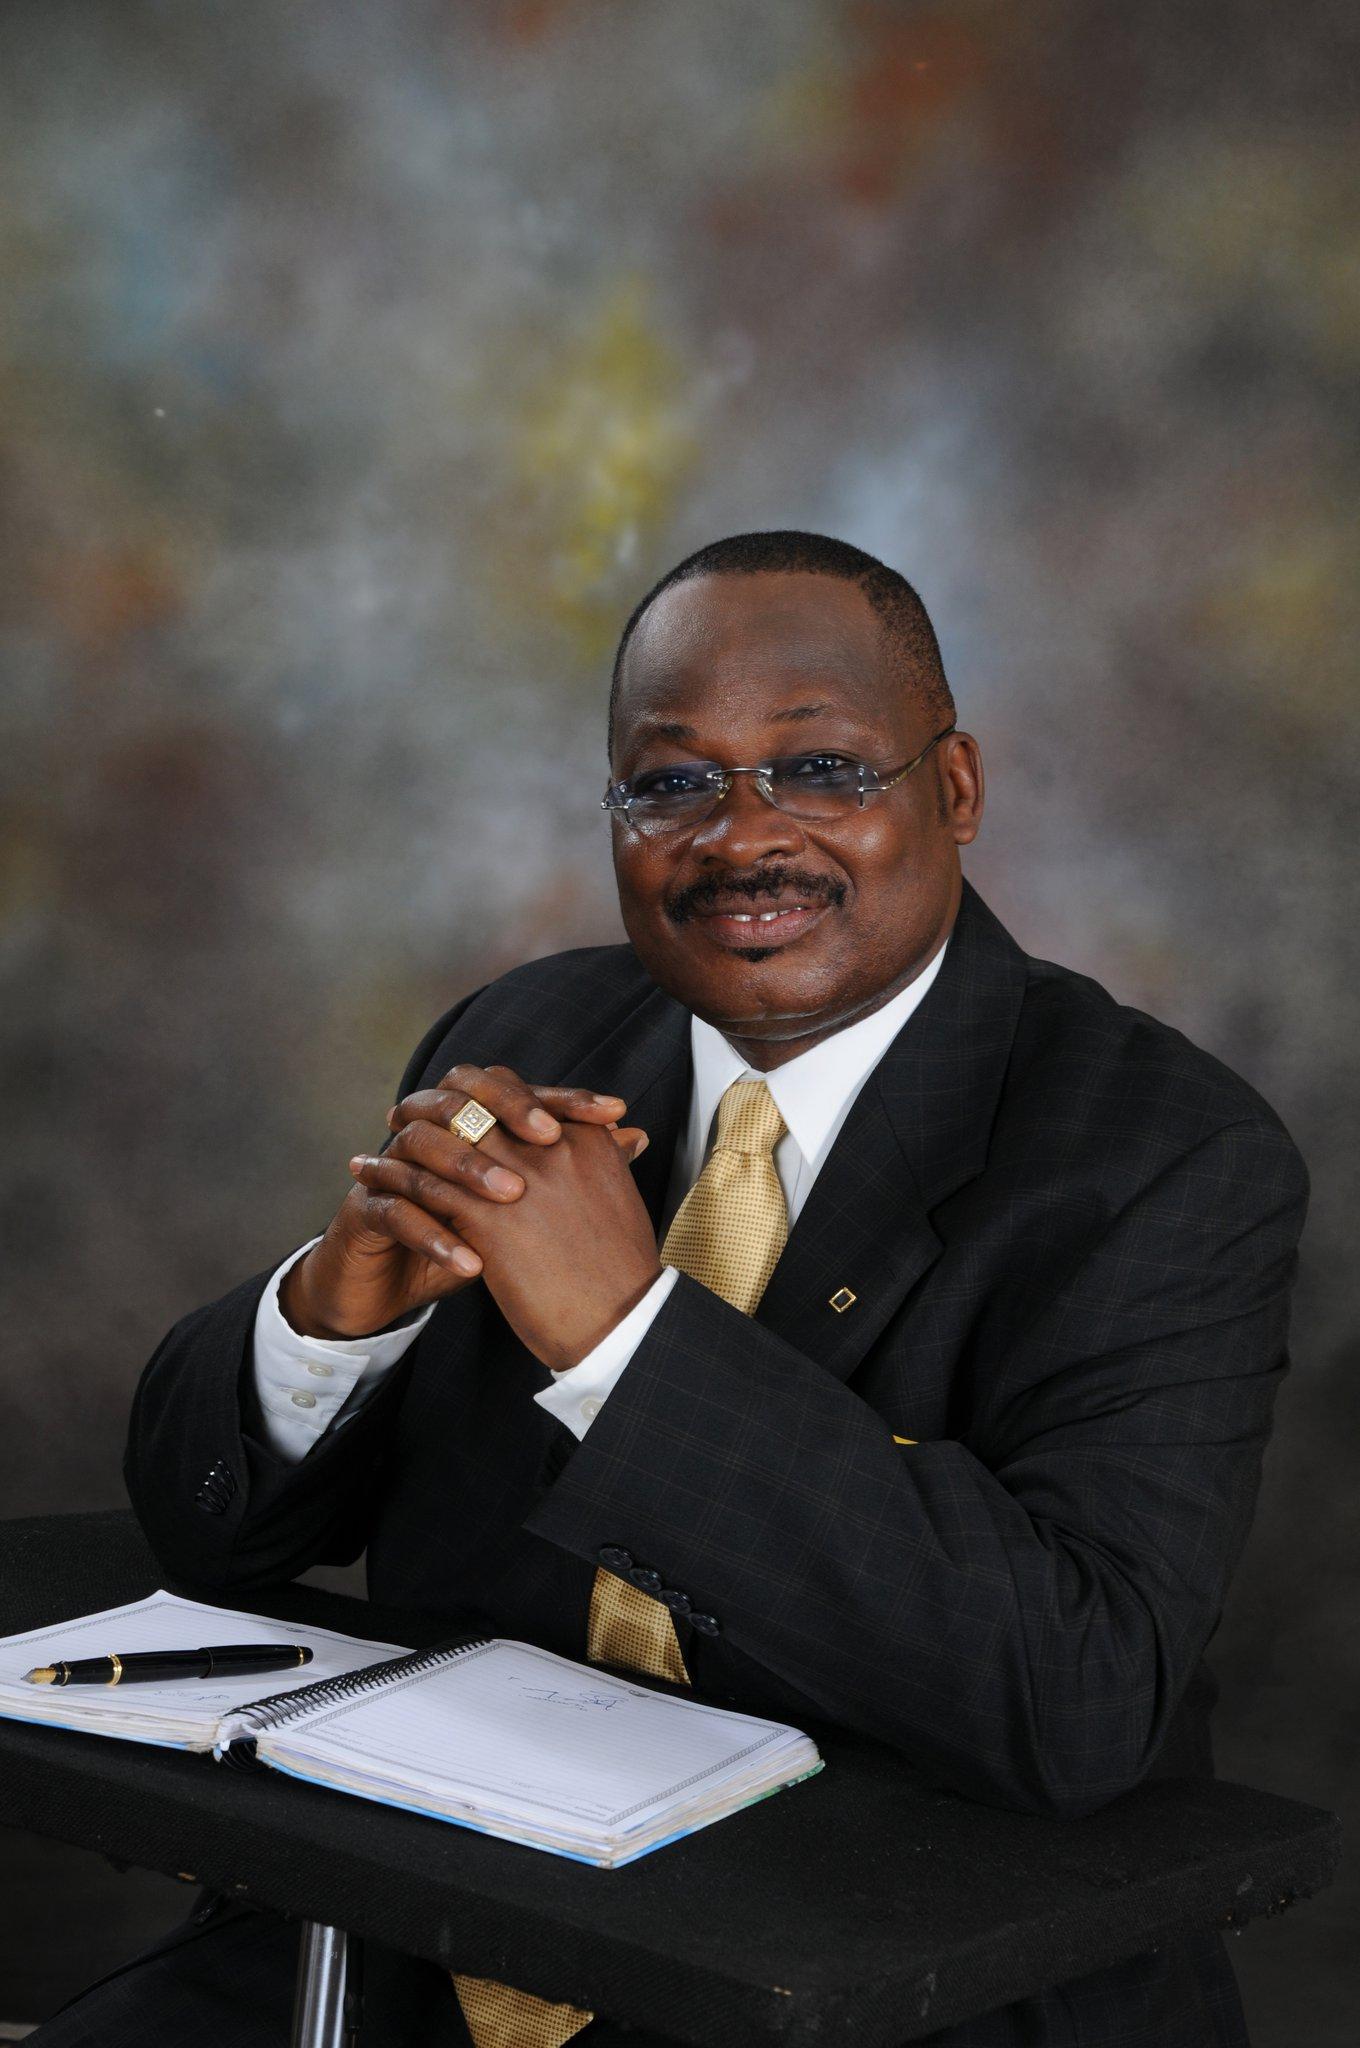 Abiola Ajimobi, Governor of Oyo state